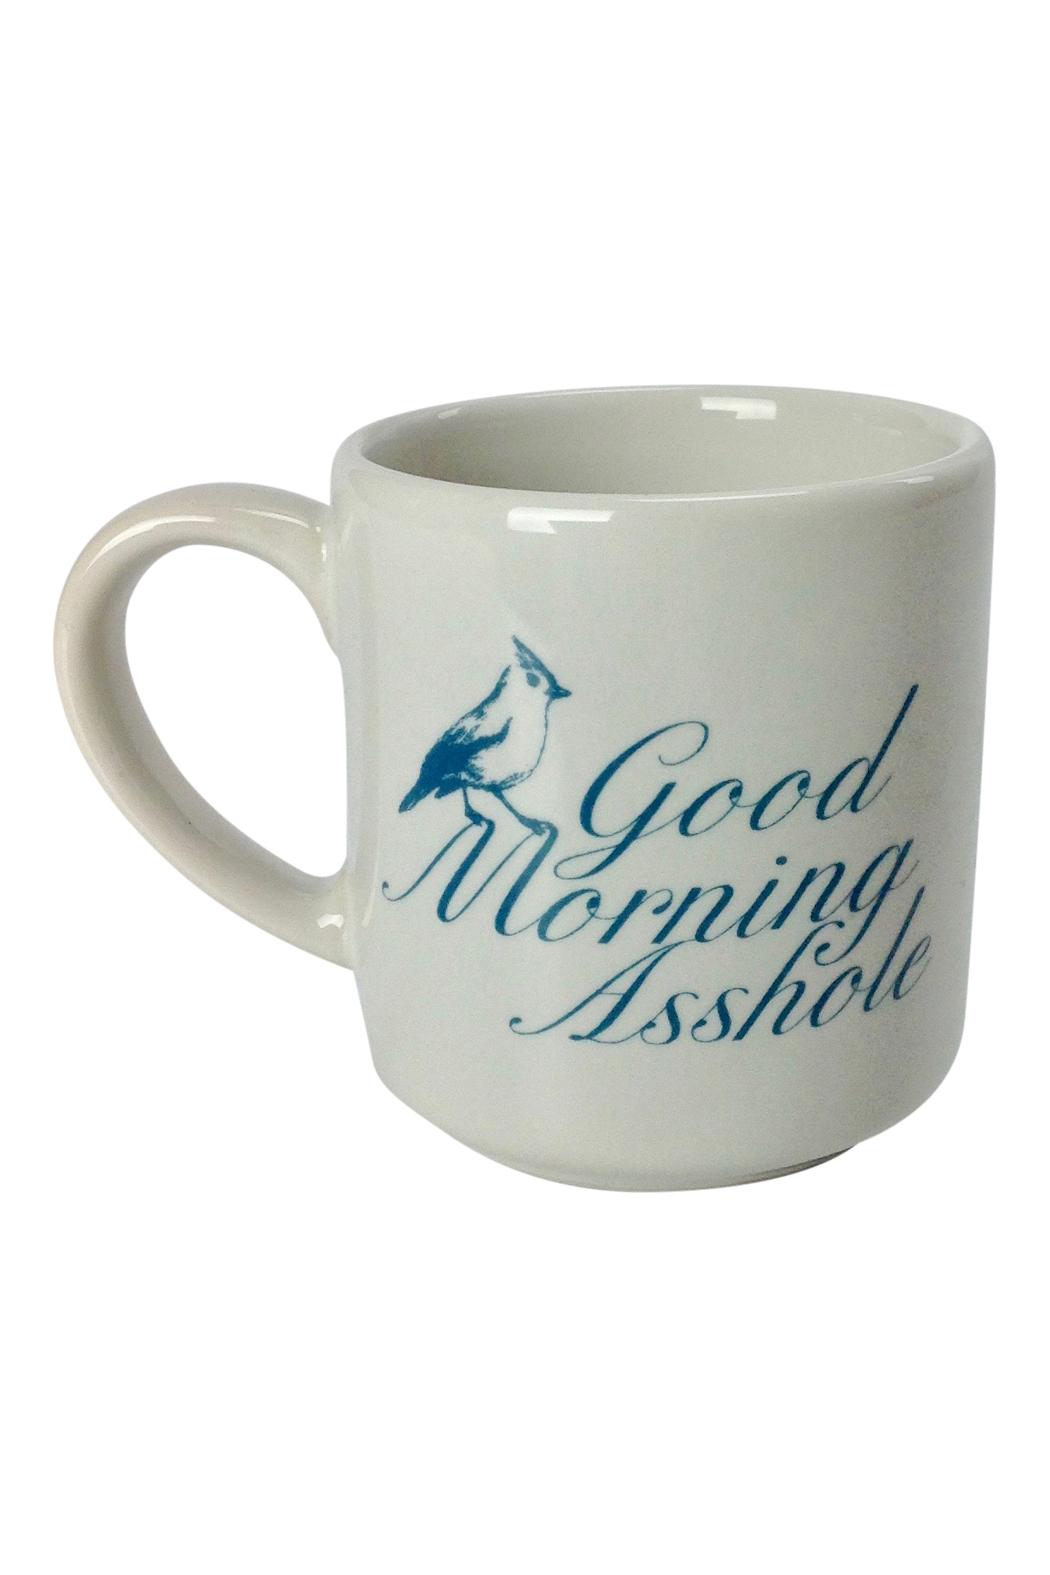 Good morning mug go home modern decor gifts for Modern new home gifts